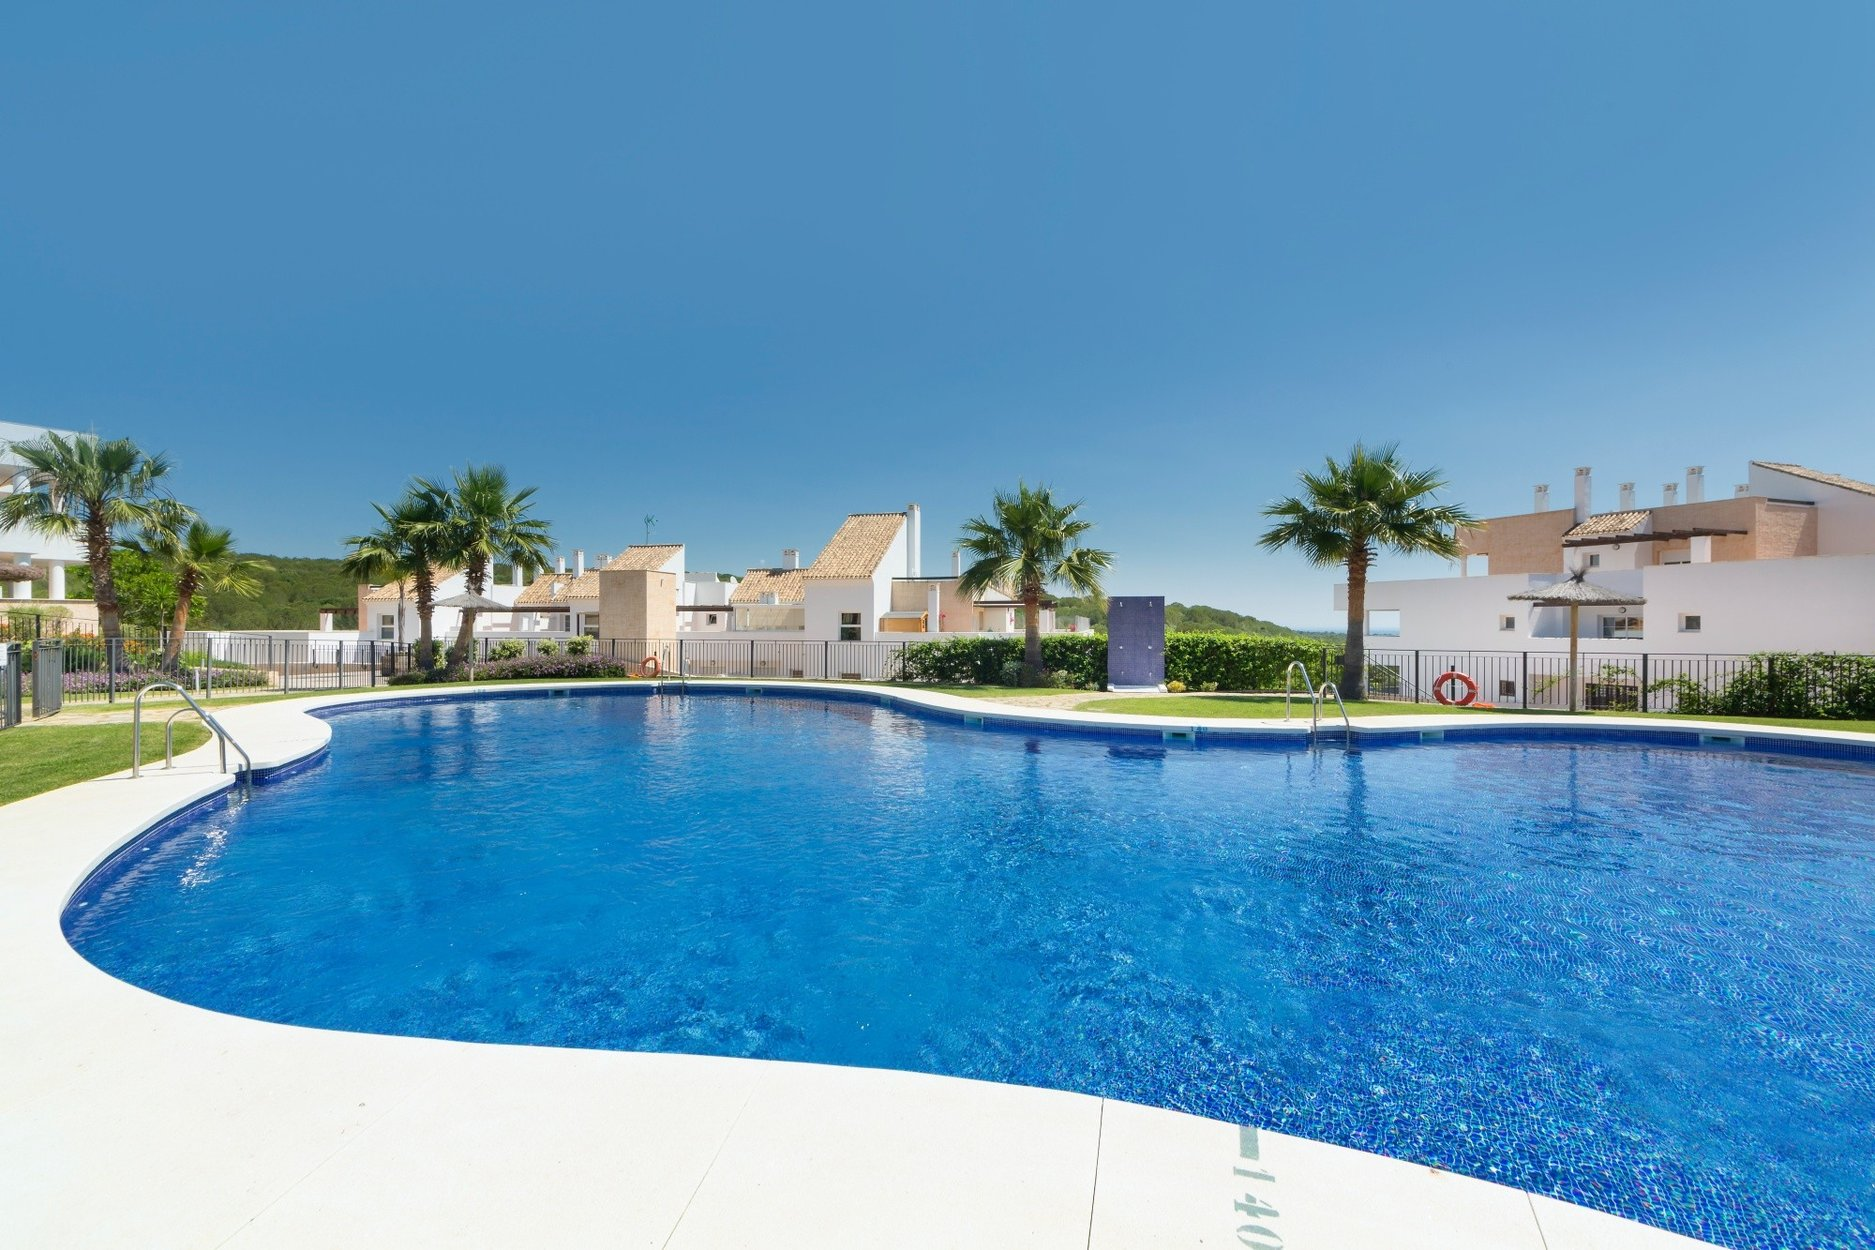 Apartment for rent in San Roque - Costa del Sol